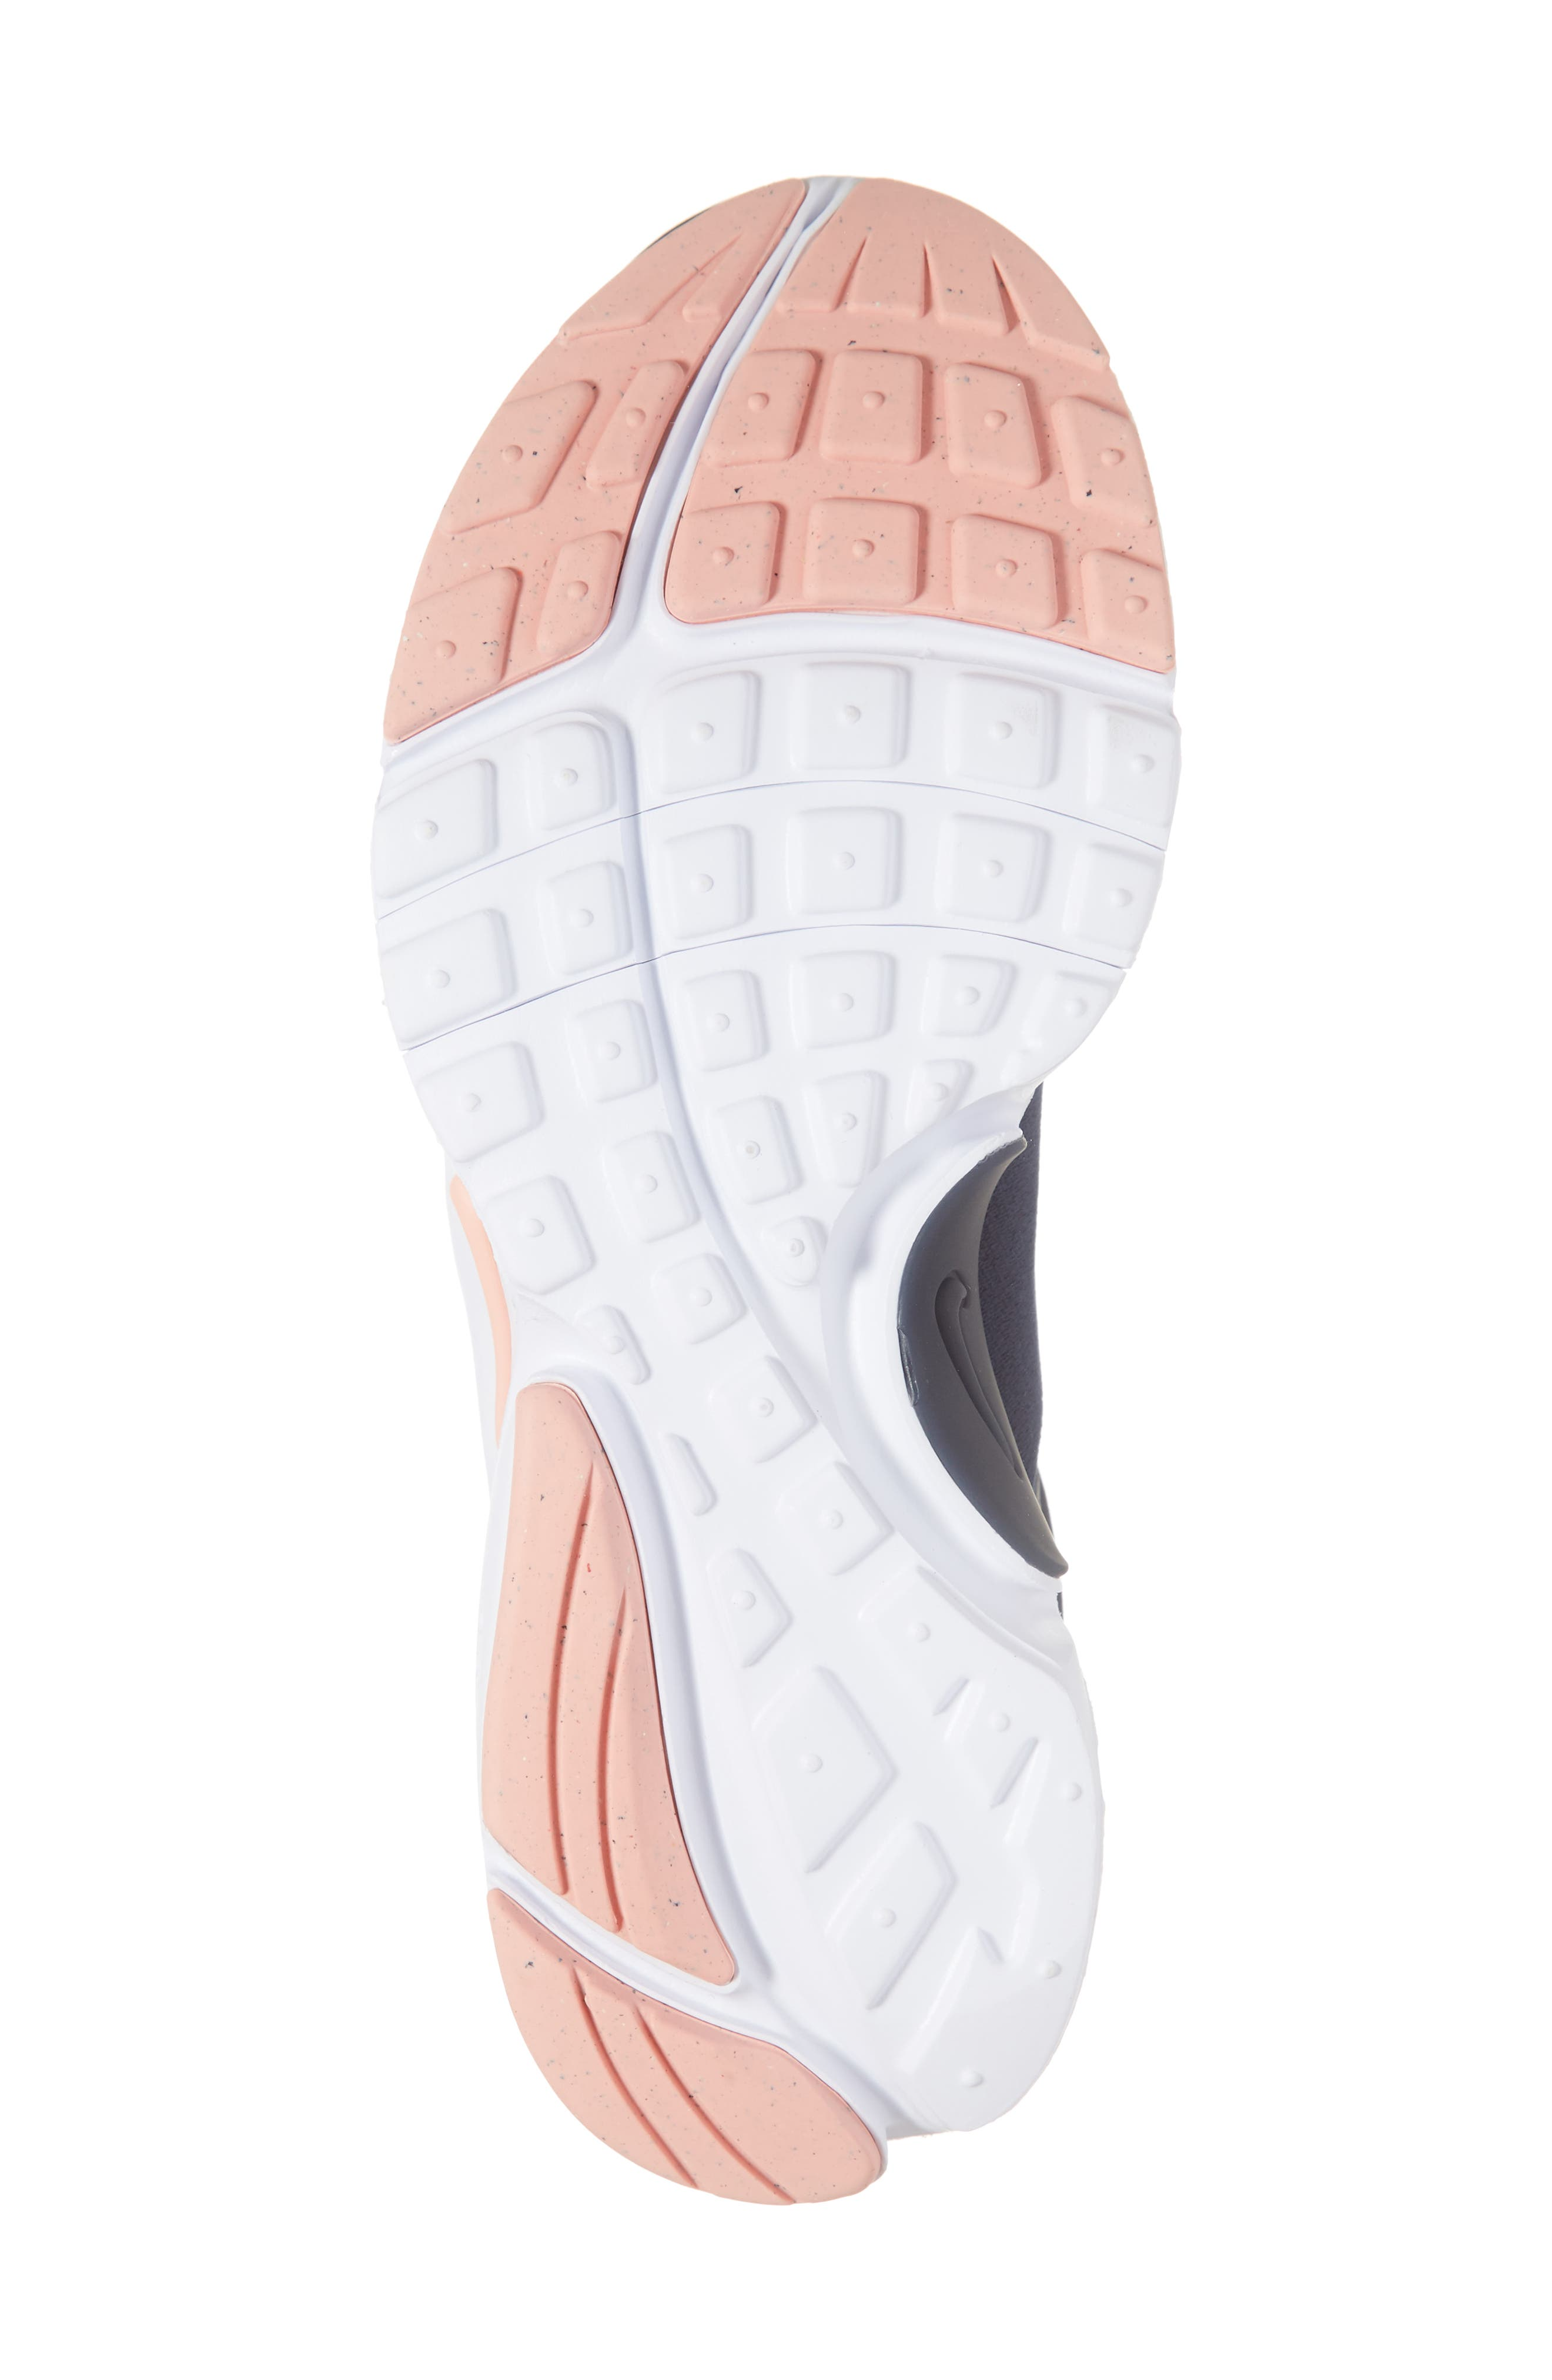 NIKE, Presto Extreme VDAY Sneaker, Alternate thumbnail 6, color, OBSIDIAN/ BLEACHED CORAL-WHITE